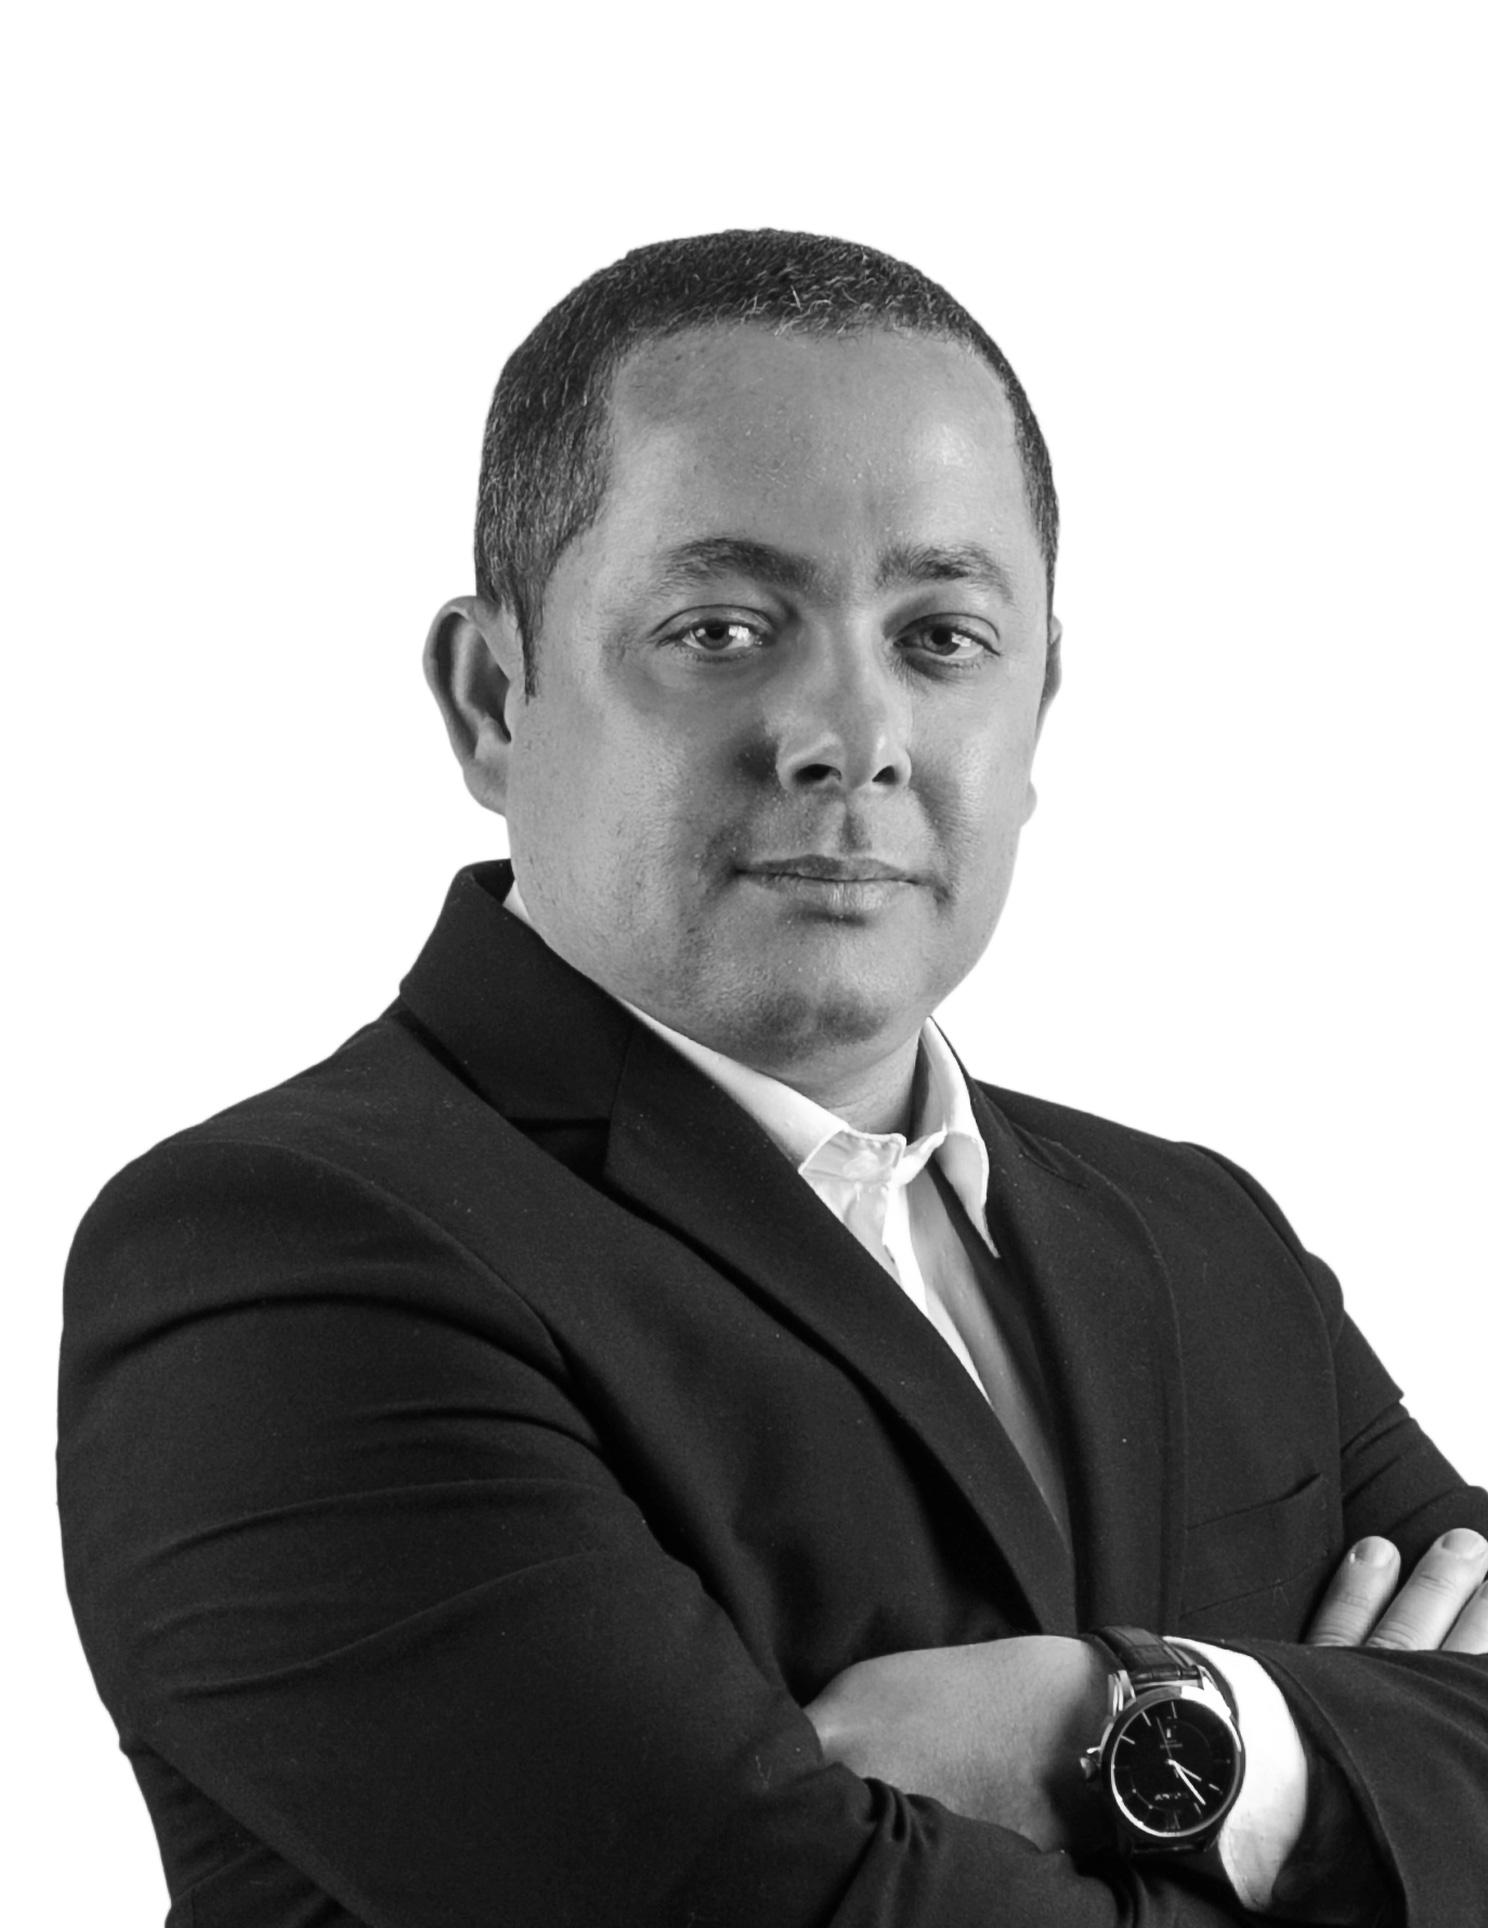 Demian Enrique Menna